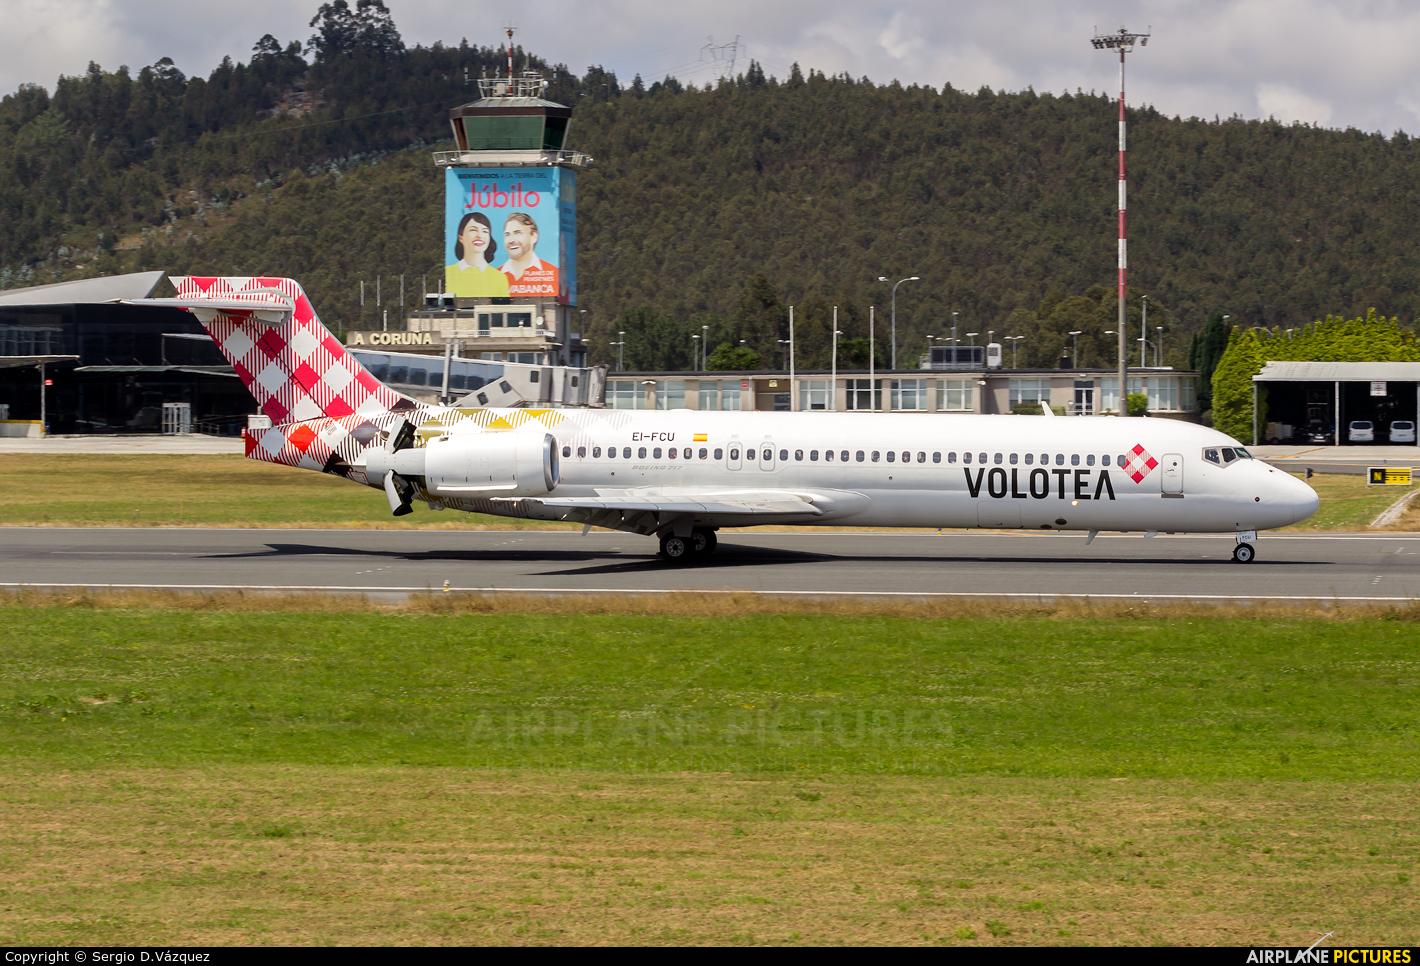 Volotea Airlines EI-FCU aircraft at La Coruña